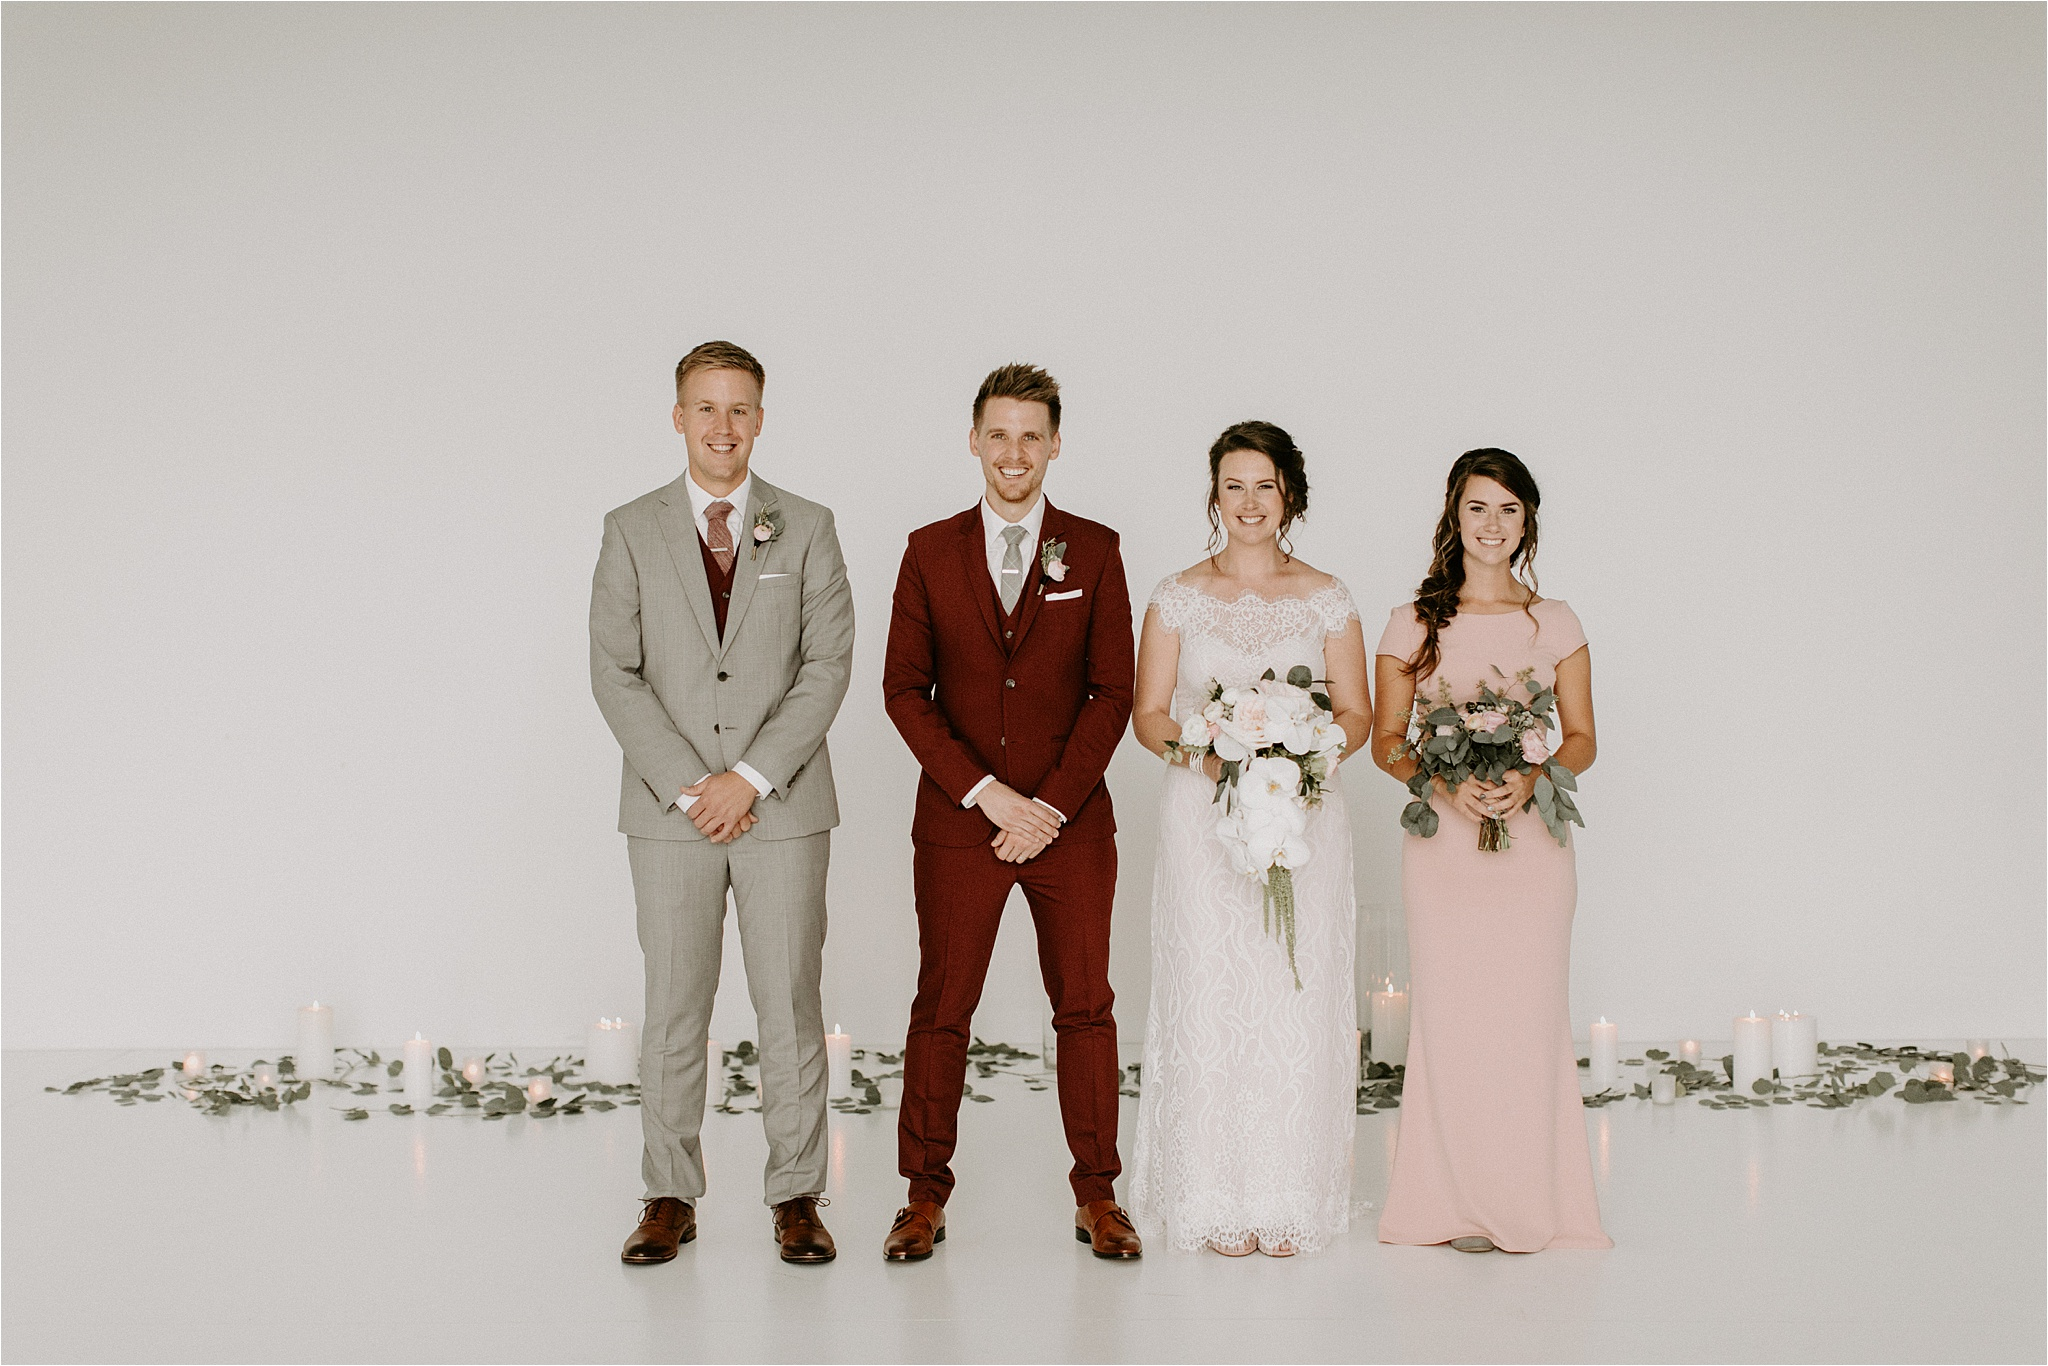 Renee_+_Dustin_-_Supply_Wedding-_0079.jpg